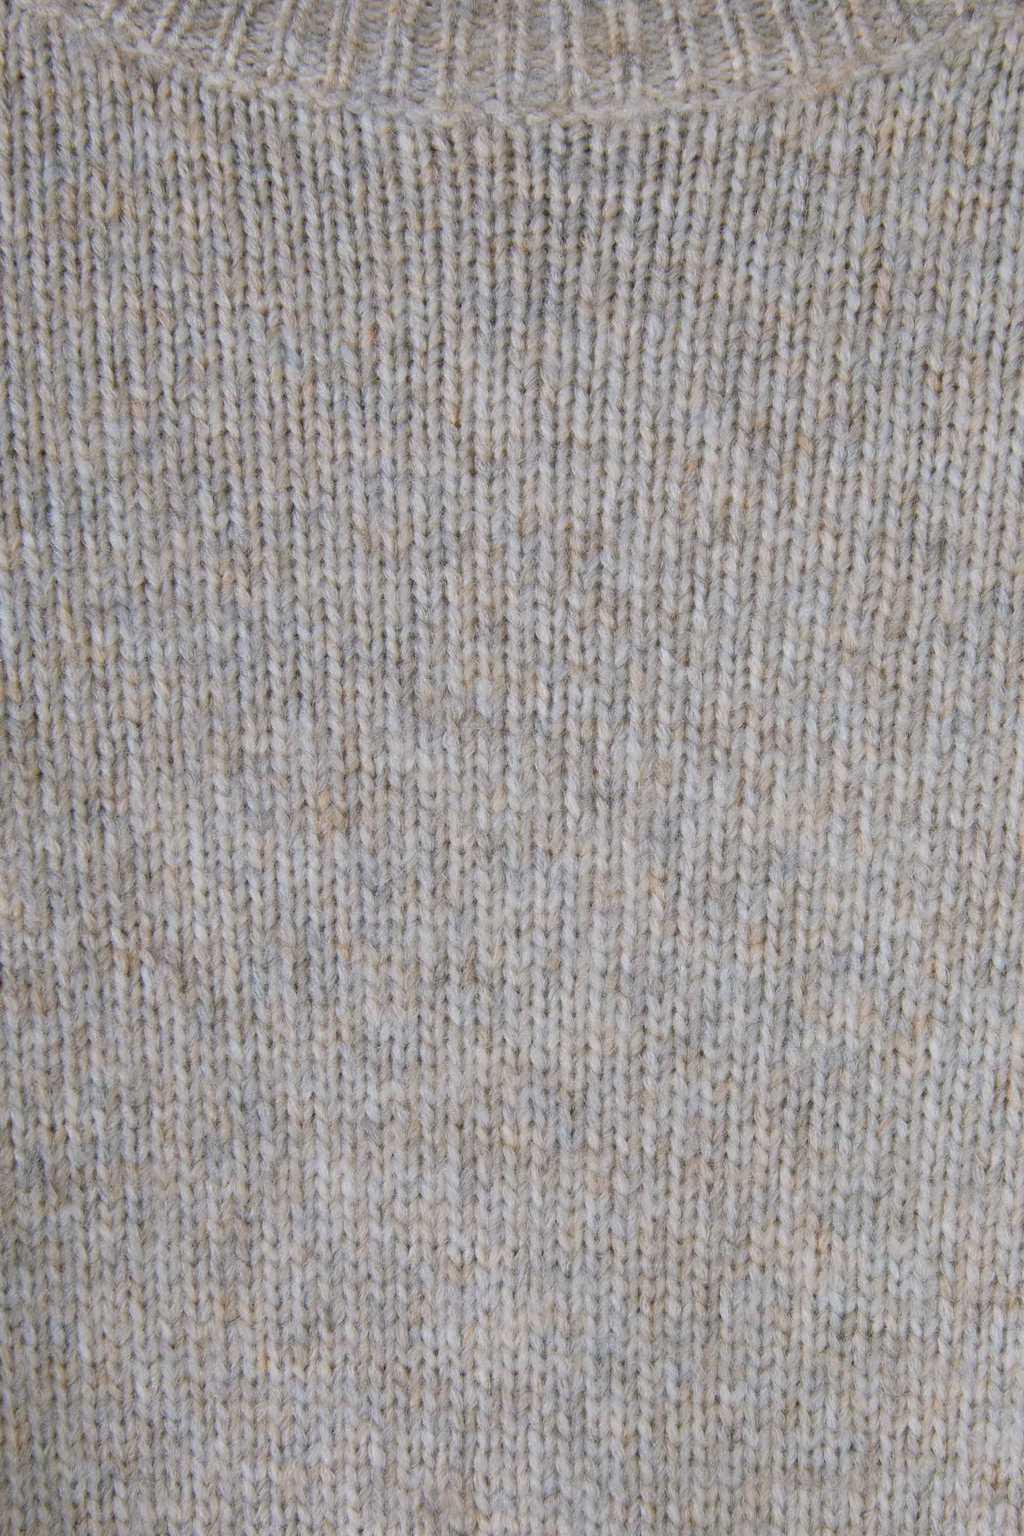 Sweater 2763 Oatmeal 6